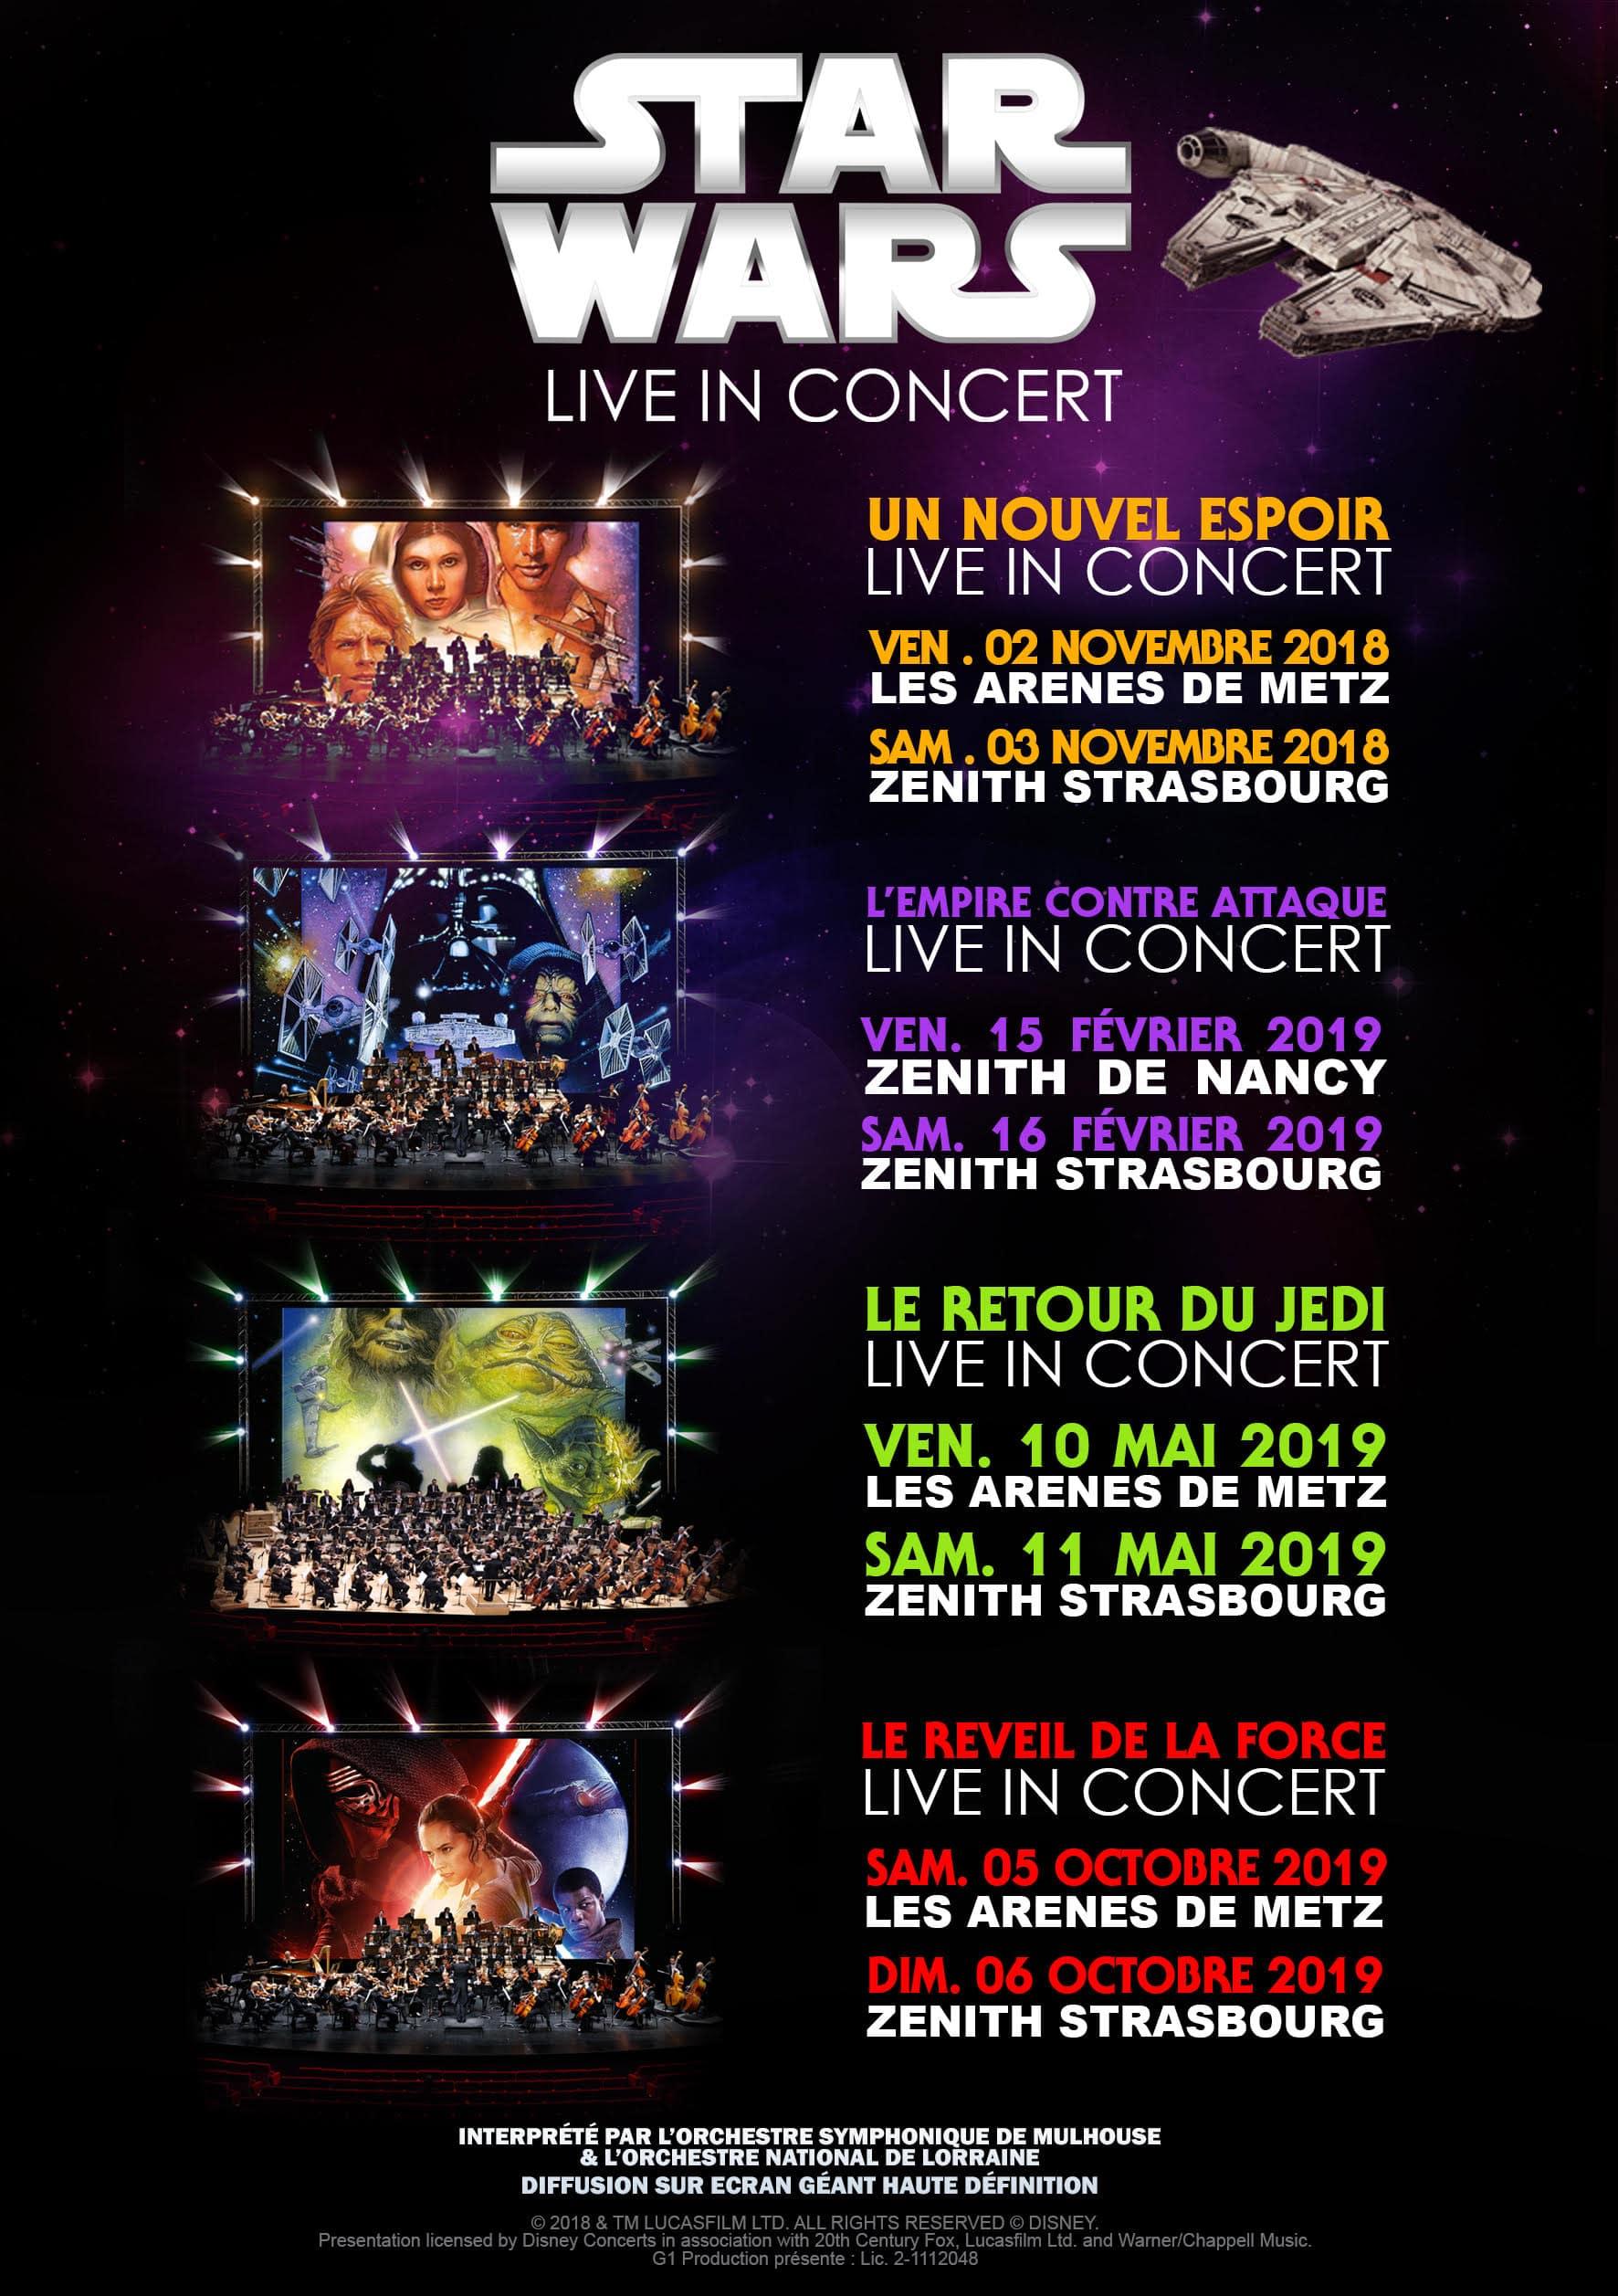 Star Wars concerts